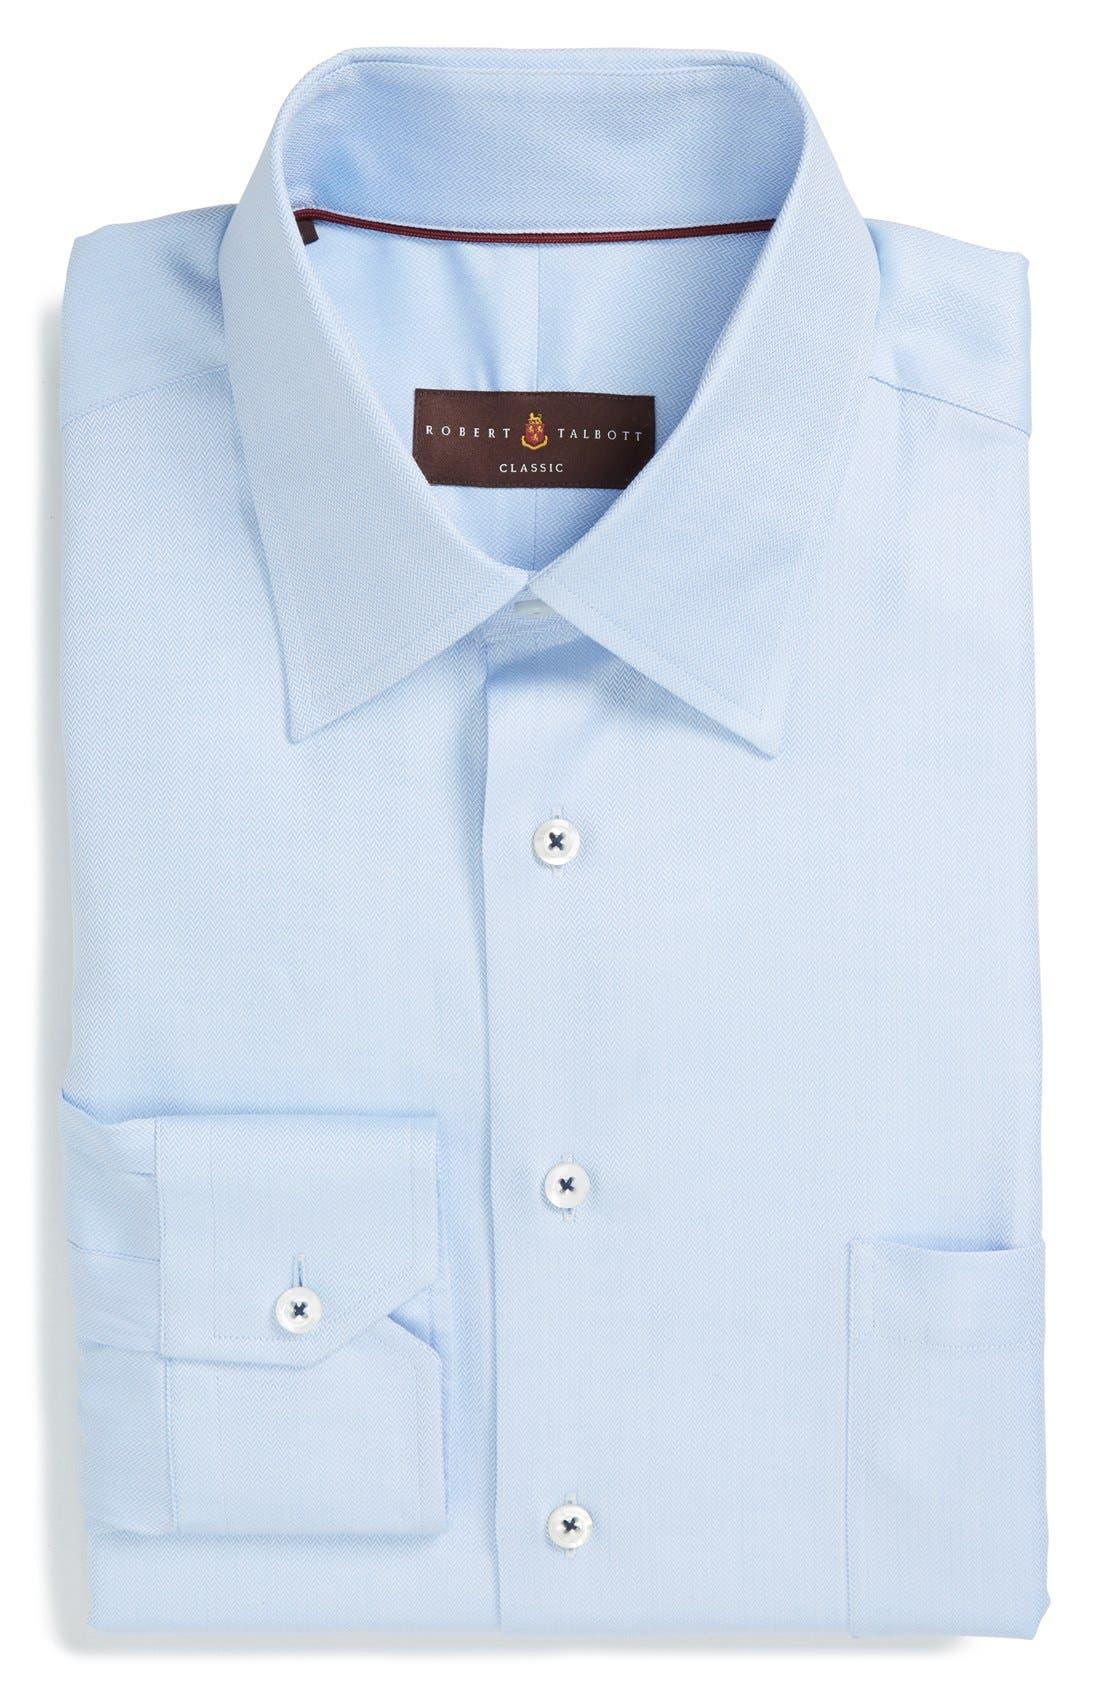 Classic Fit Dress Shirt,                             Main thumbnail 1, color,                             Light Blue